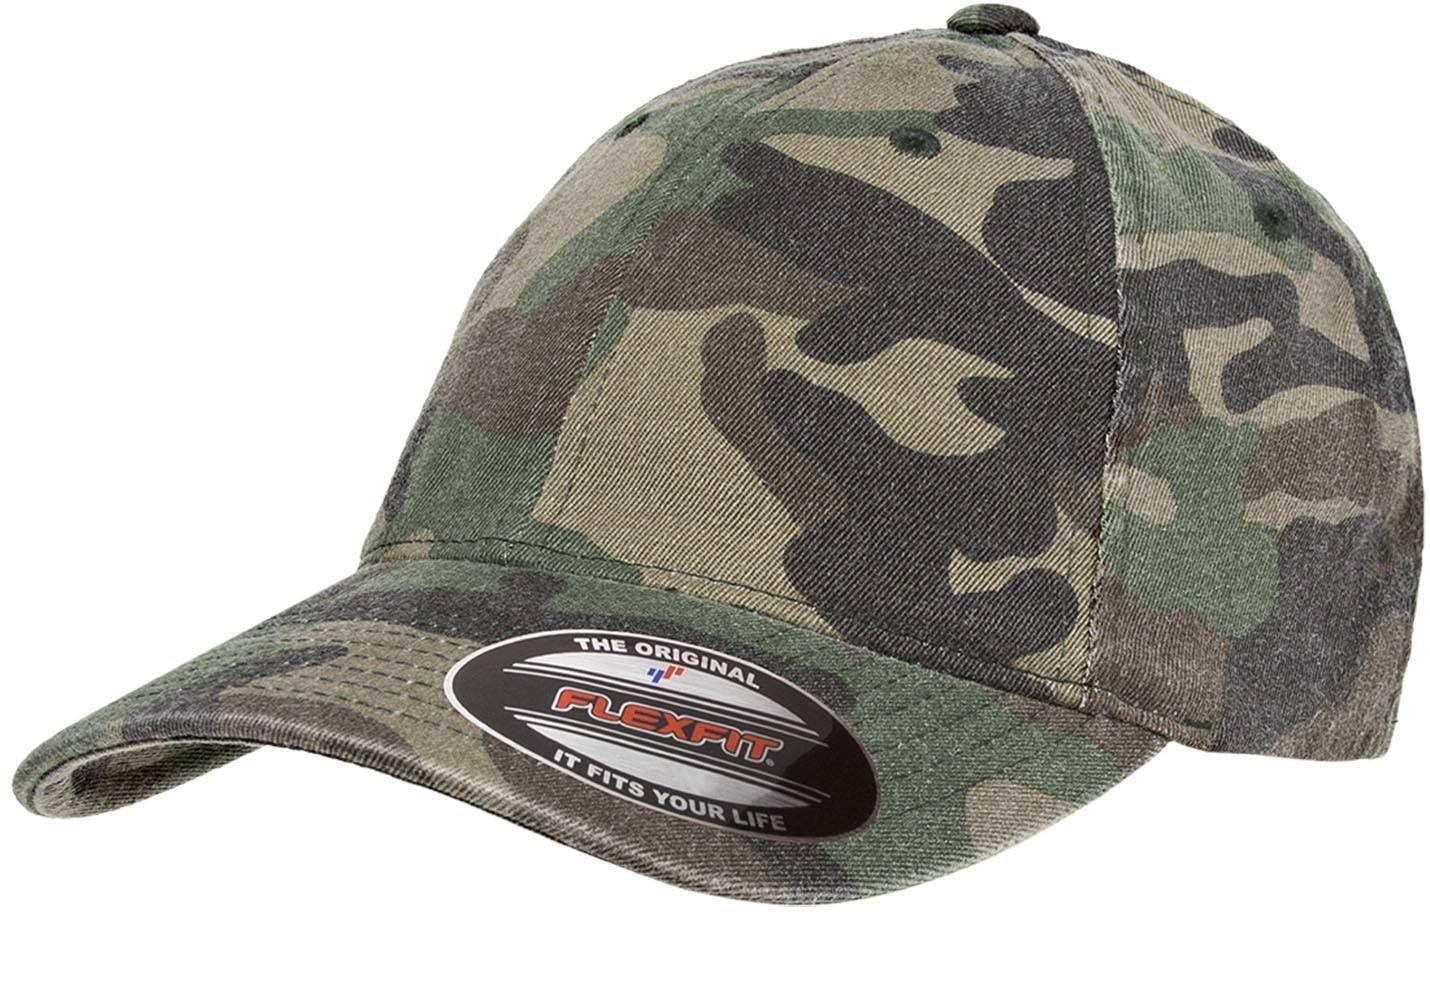 Wholesale Flexfit Yupoong 6977CA Flexfit Garment Washed Camo Hat  Green  Camo  1ae38a6c4dc3